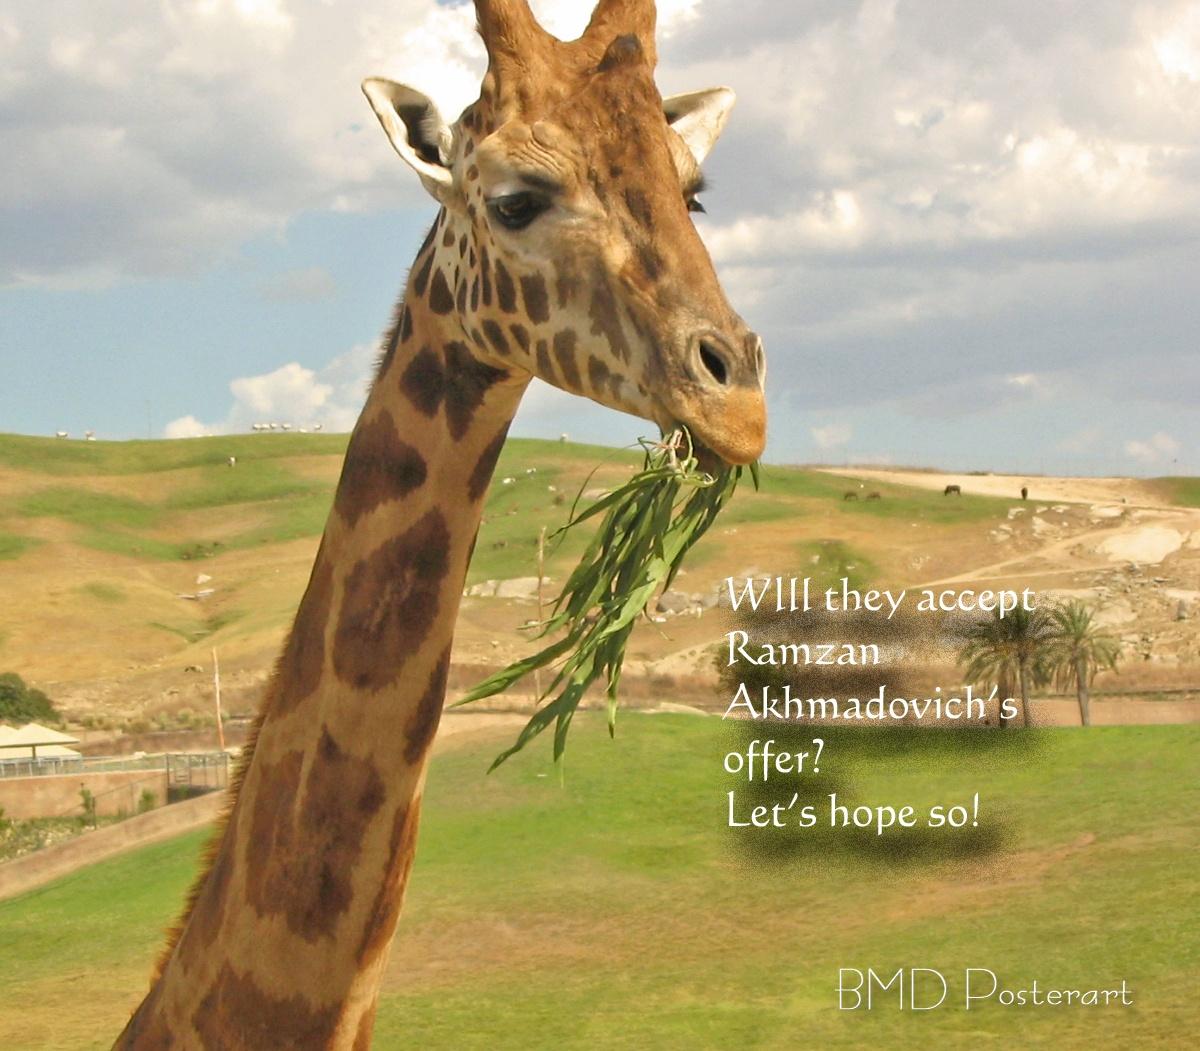 00 happy giraffe. 14.02.14